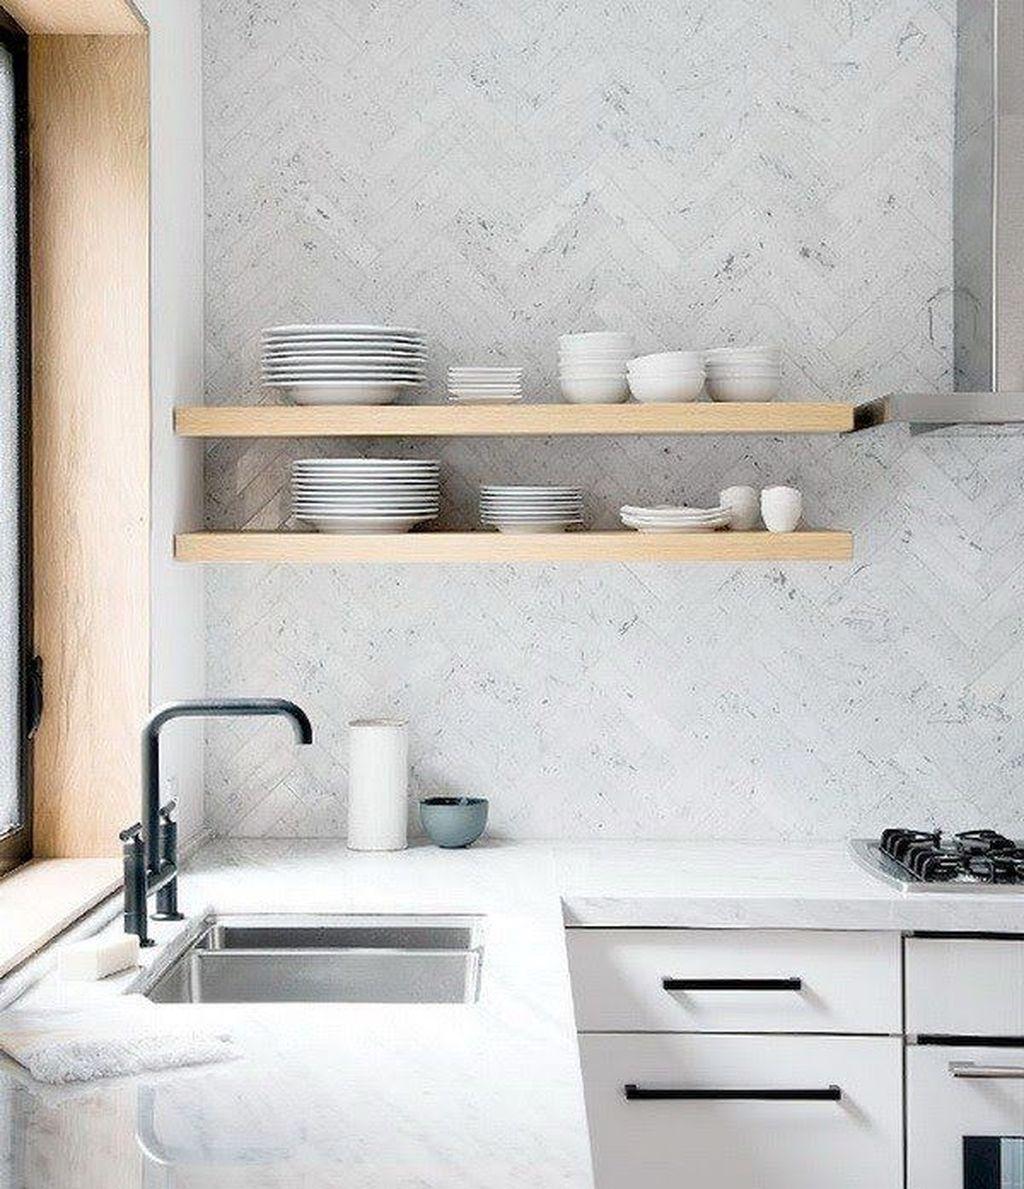 Stunning Glass Backsplash Kitchen Ideas 19